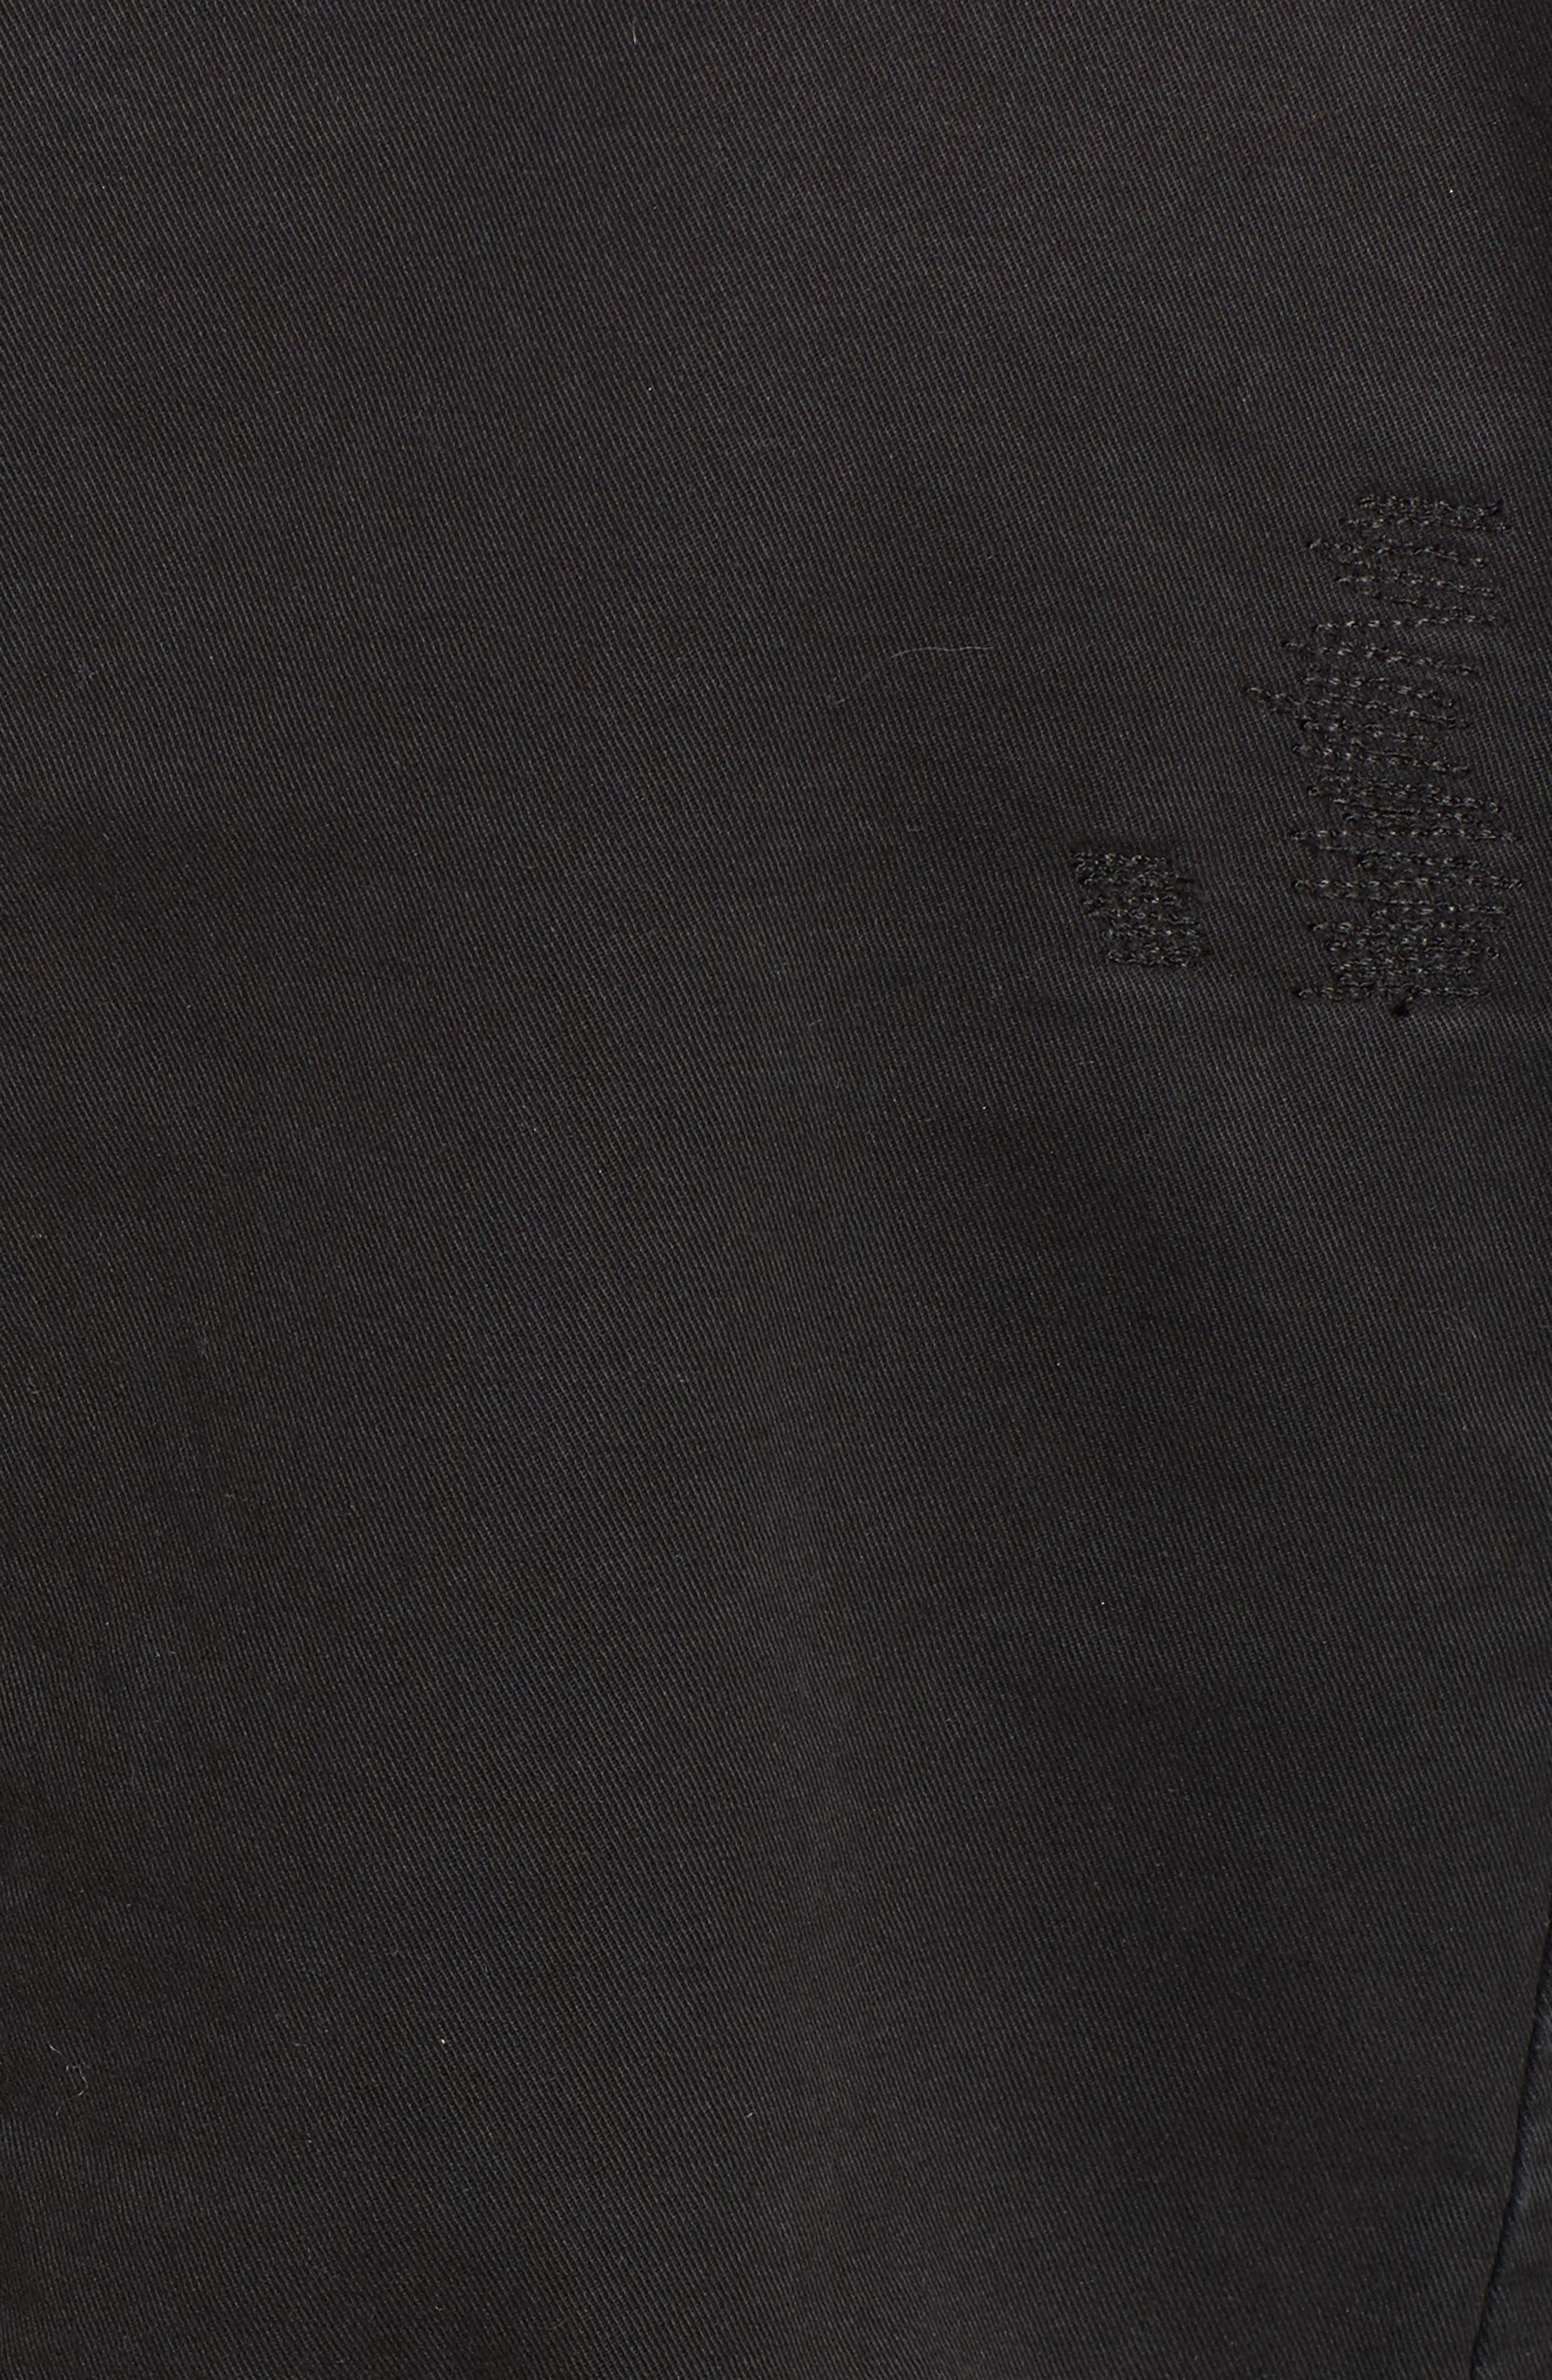 Vladimir Grunge Jacket,                             Alternate thumbnail 6, color,                             001